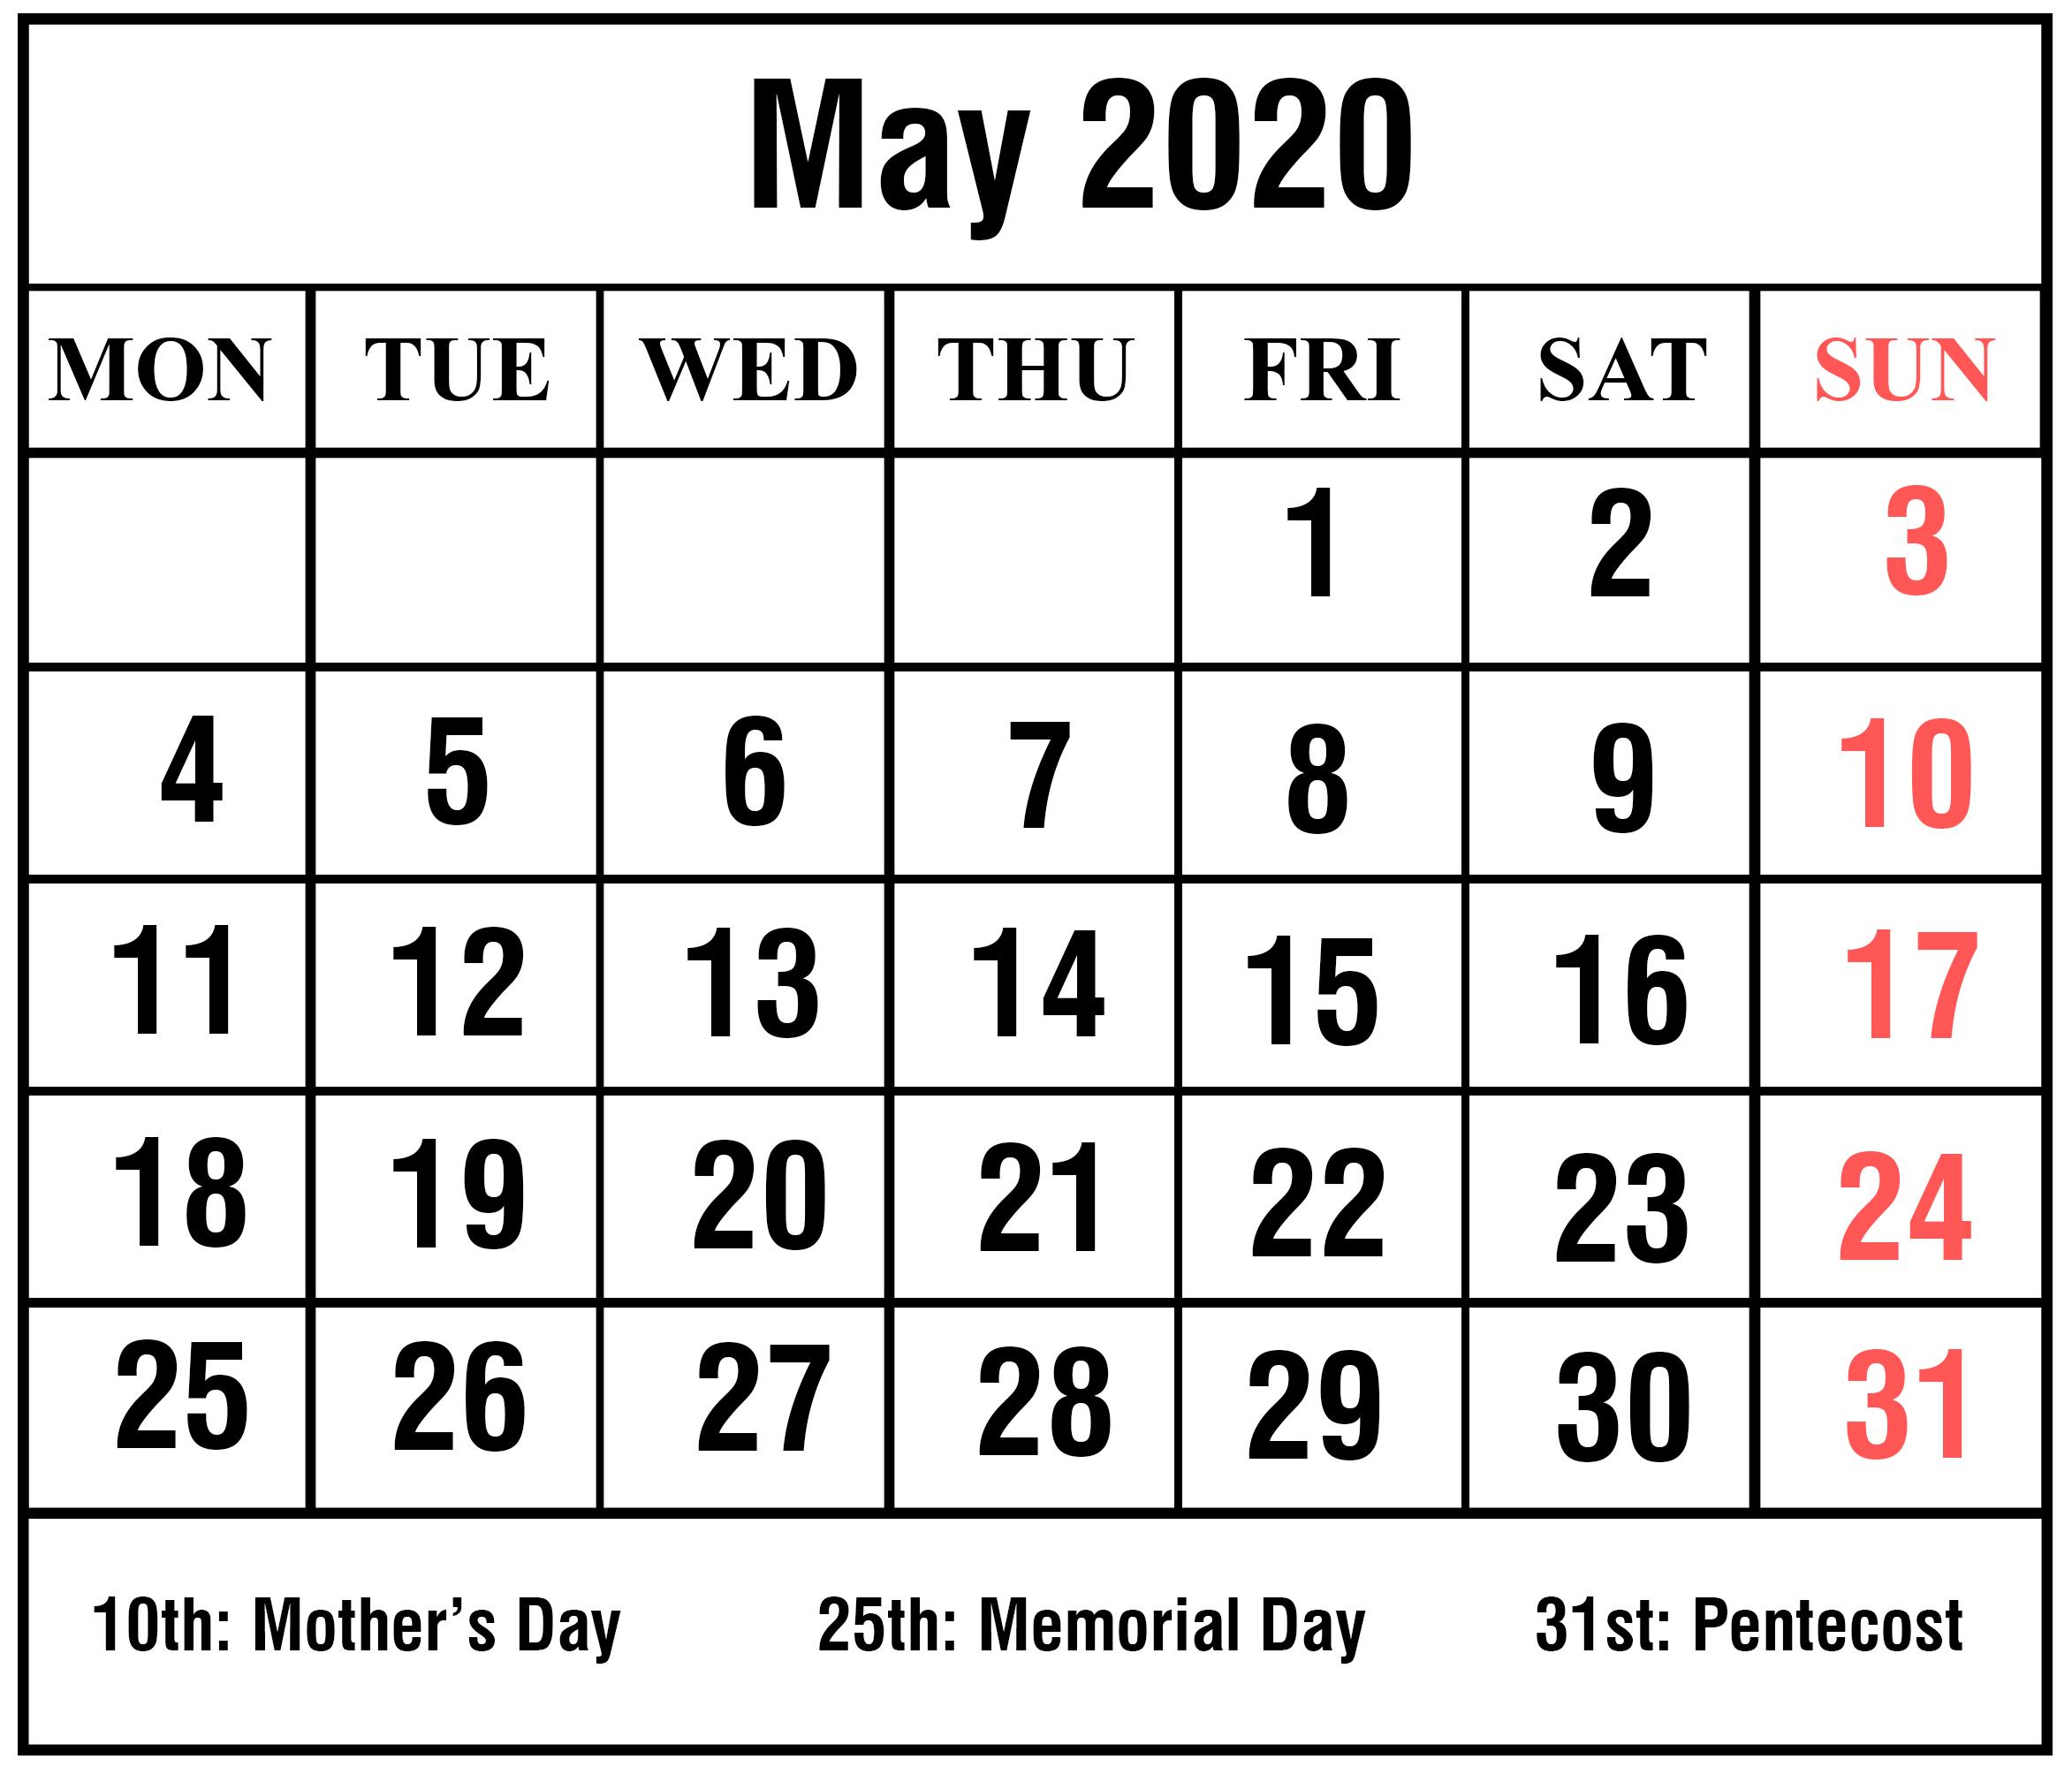 May 2020 Calendar | Printable April Calendar Template